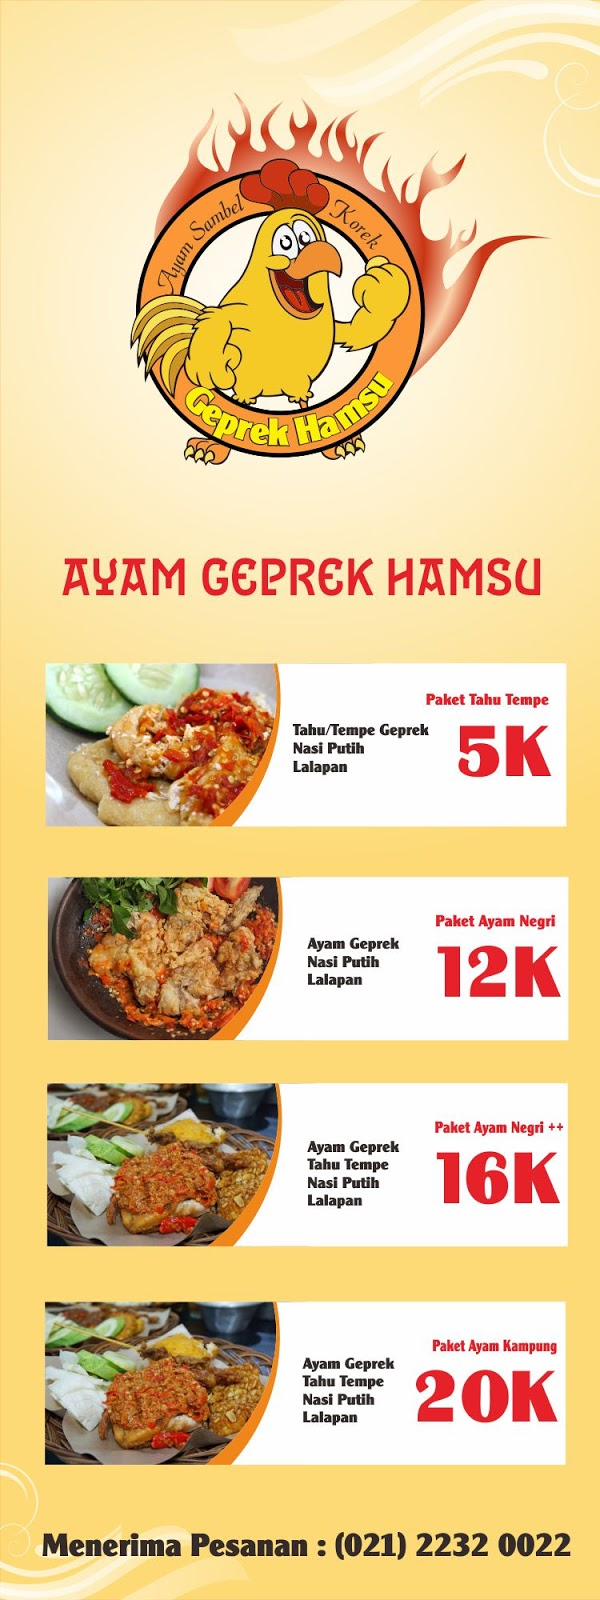 Contoh X Banner Ayam Bakar - desain spanduk kreatif